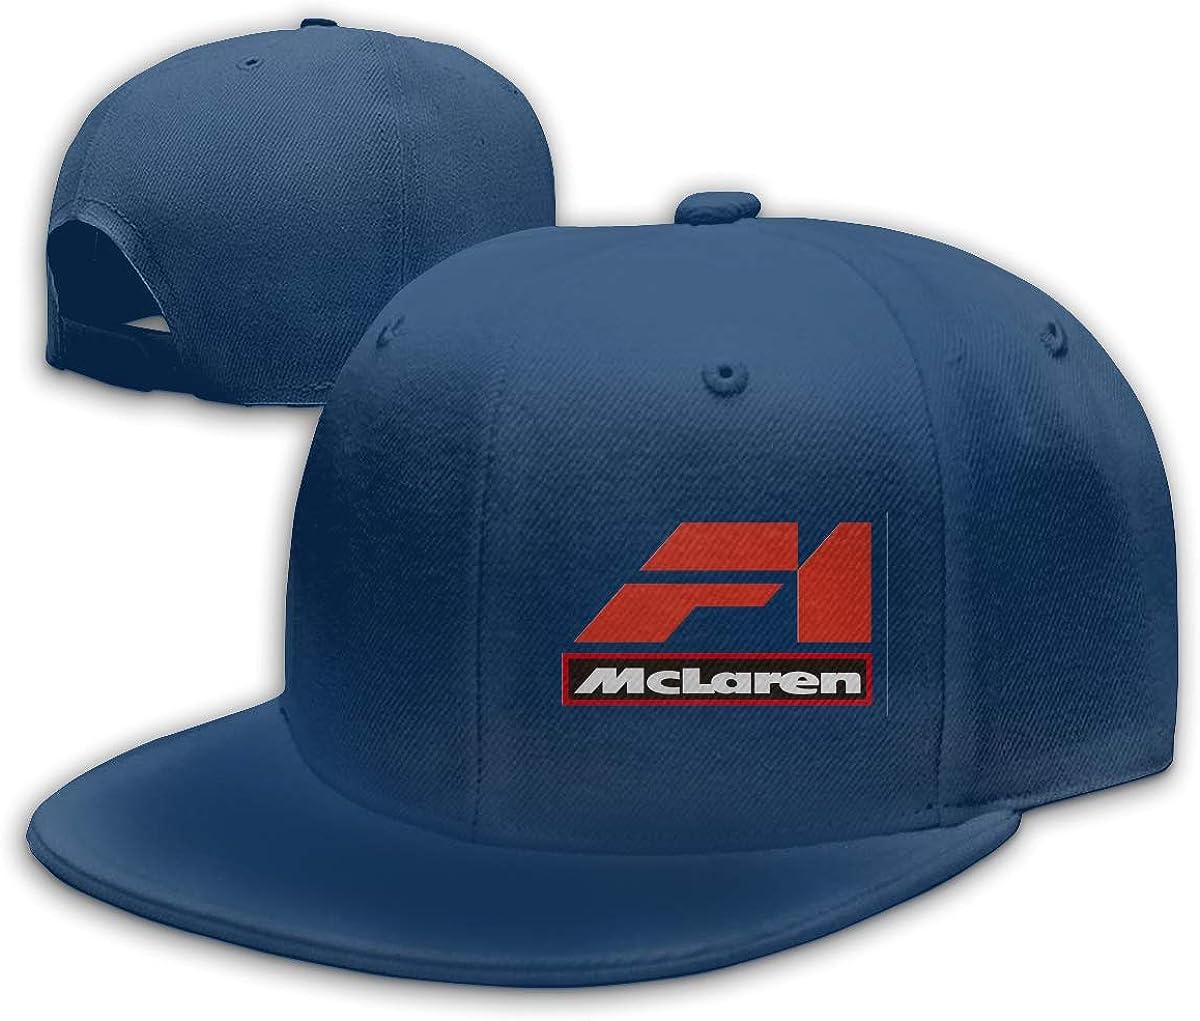 ZaHome Mens Mclaren_f1 Cotton Baseball Snapback Hats Adjustable Structured Fit Hat